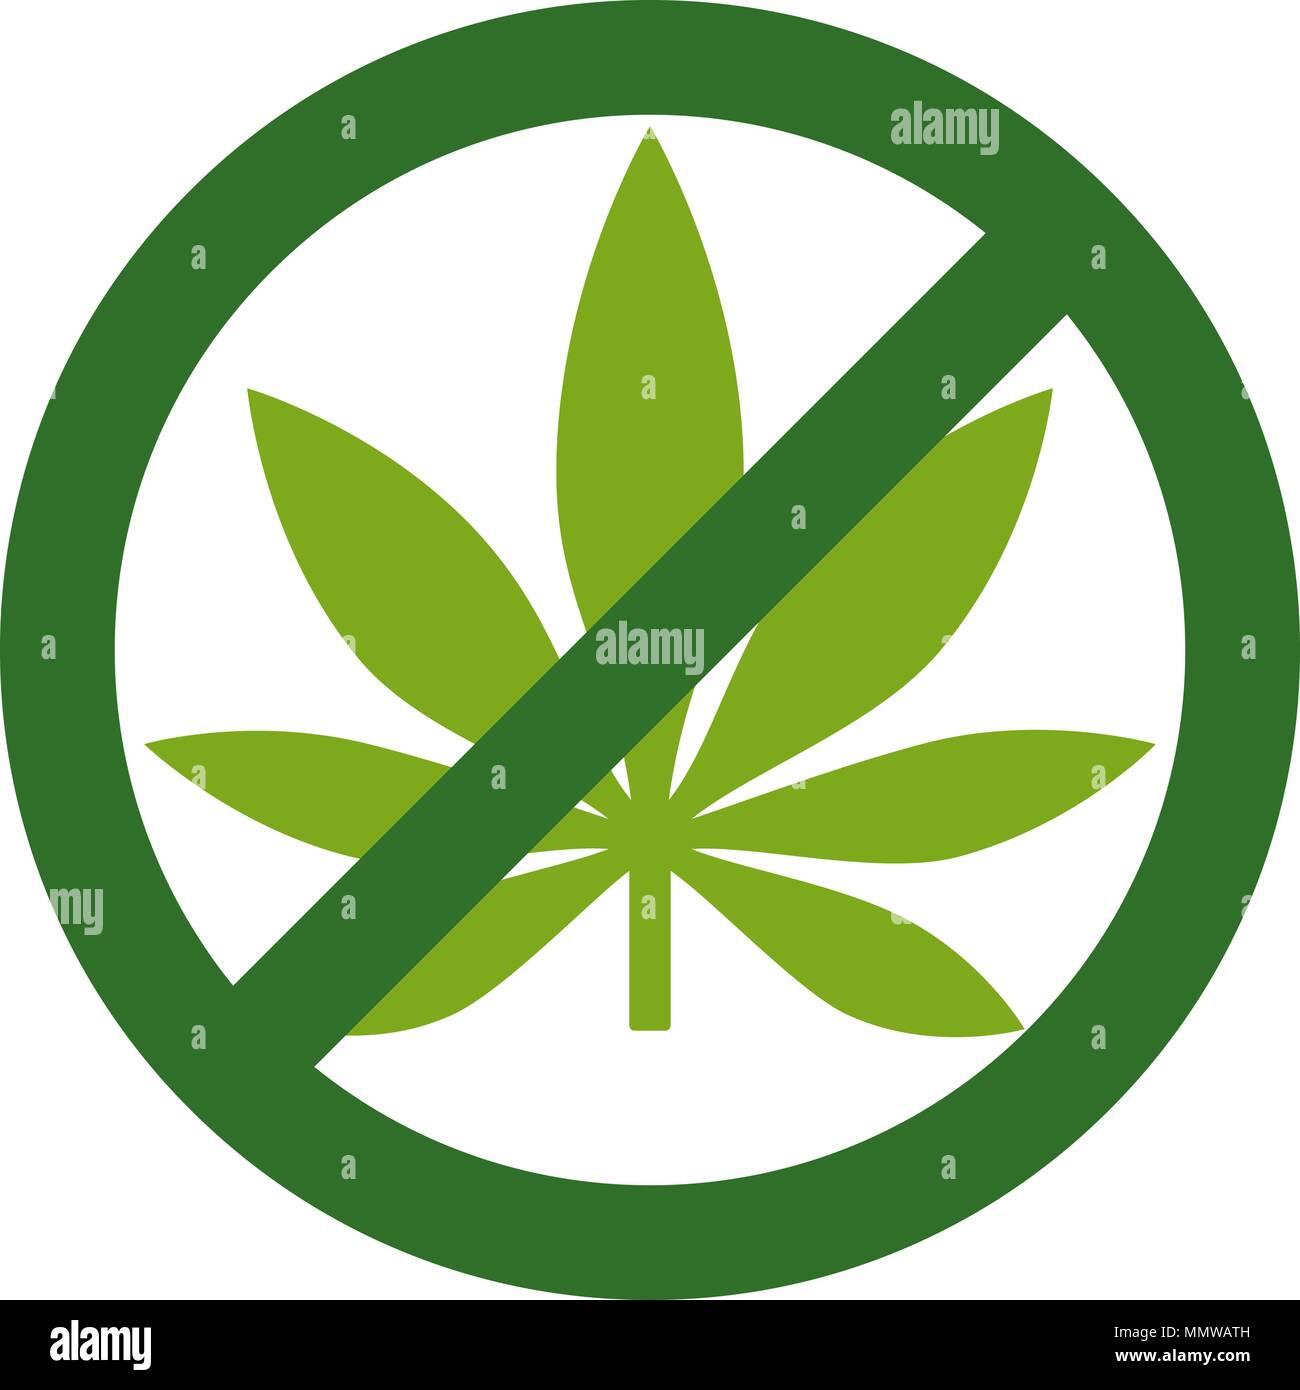 Marijuana Leaf with forbidden sign - no drug. No to marijuana. Cannabis leaf icon in prohibition green circle. No drugs allowed. Anti drugs. No smokin - Stock Image